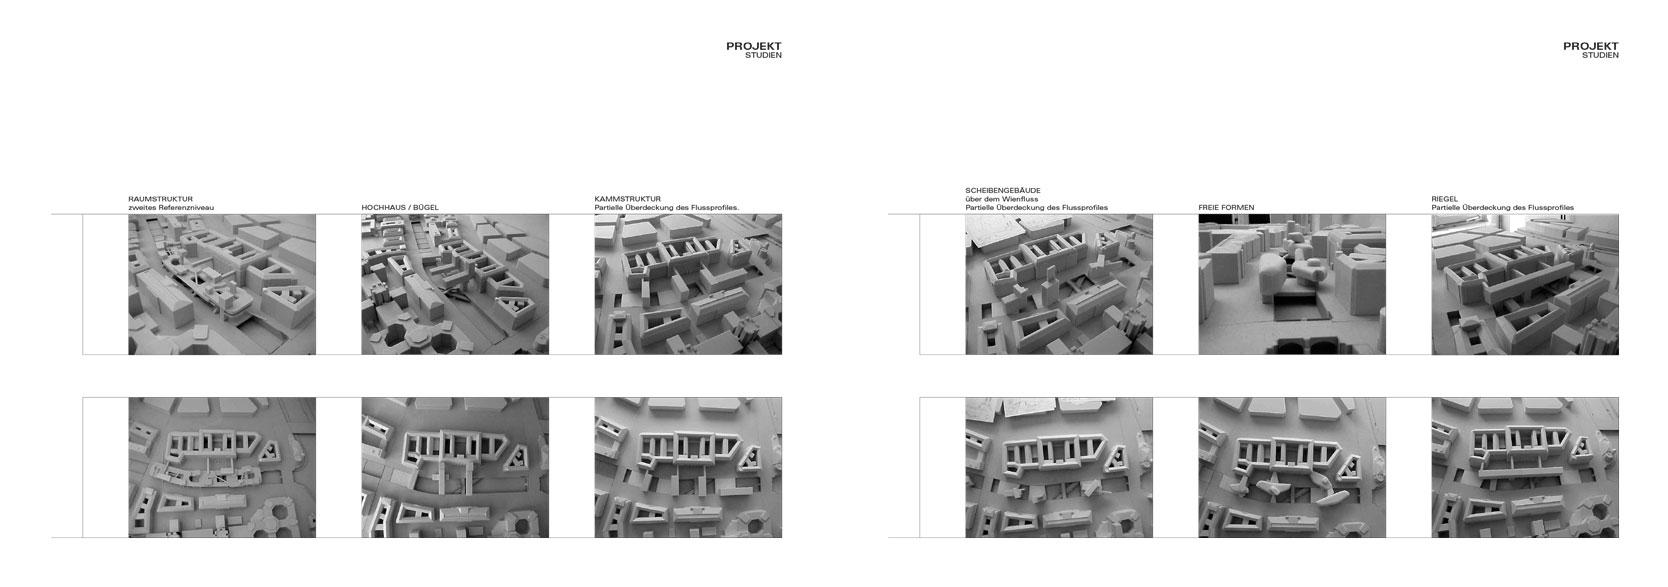 Wienfluss Architektur: Studies